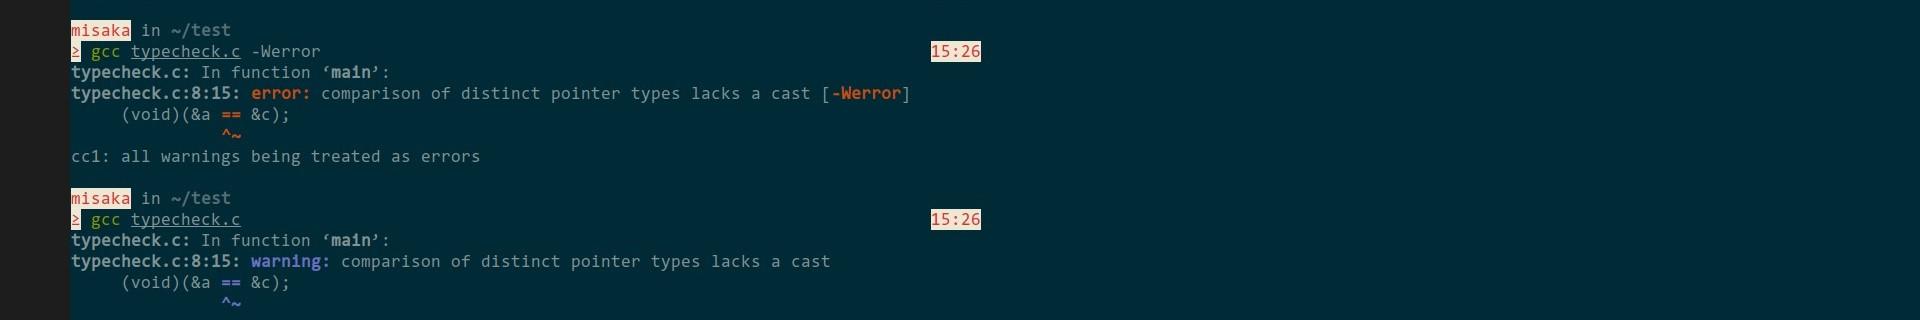 typecheck 运行测试图